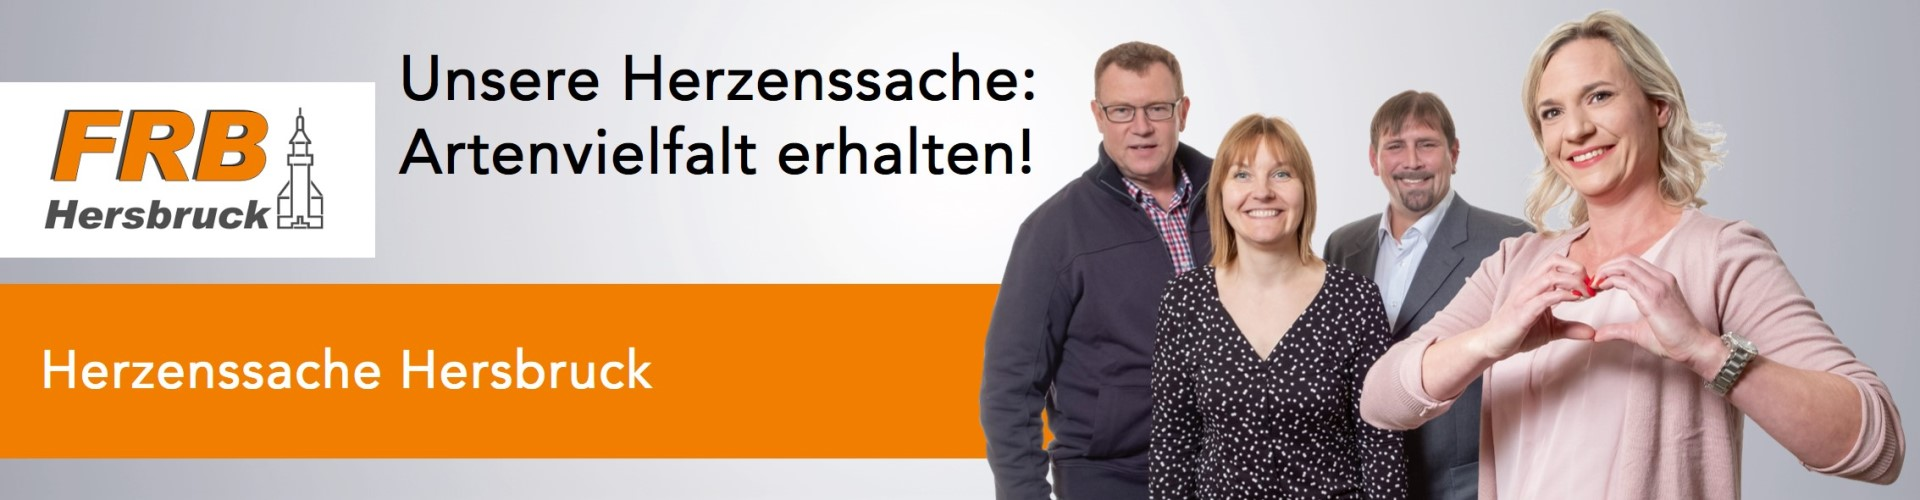 "Banner Herzenssache ""Artenvielfalt erhalten!"""